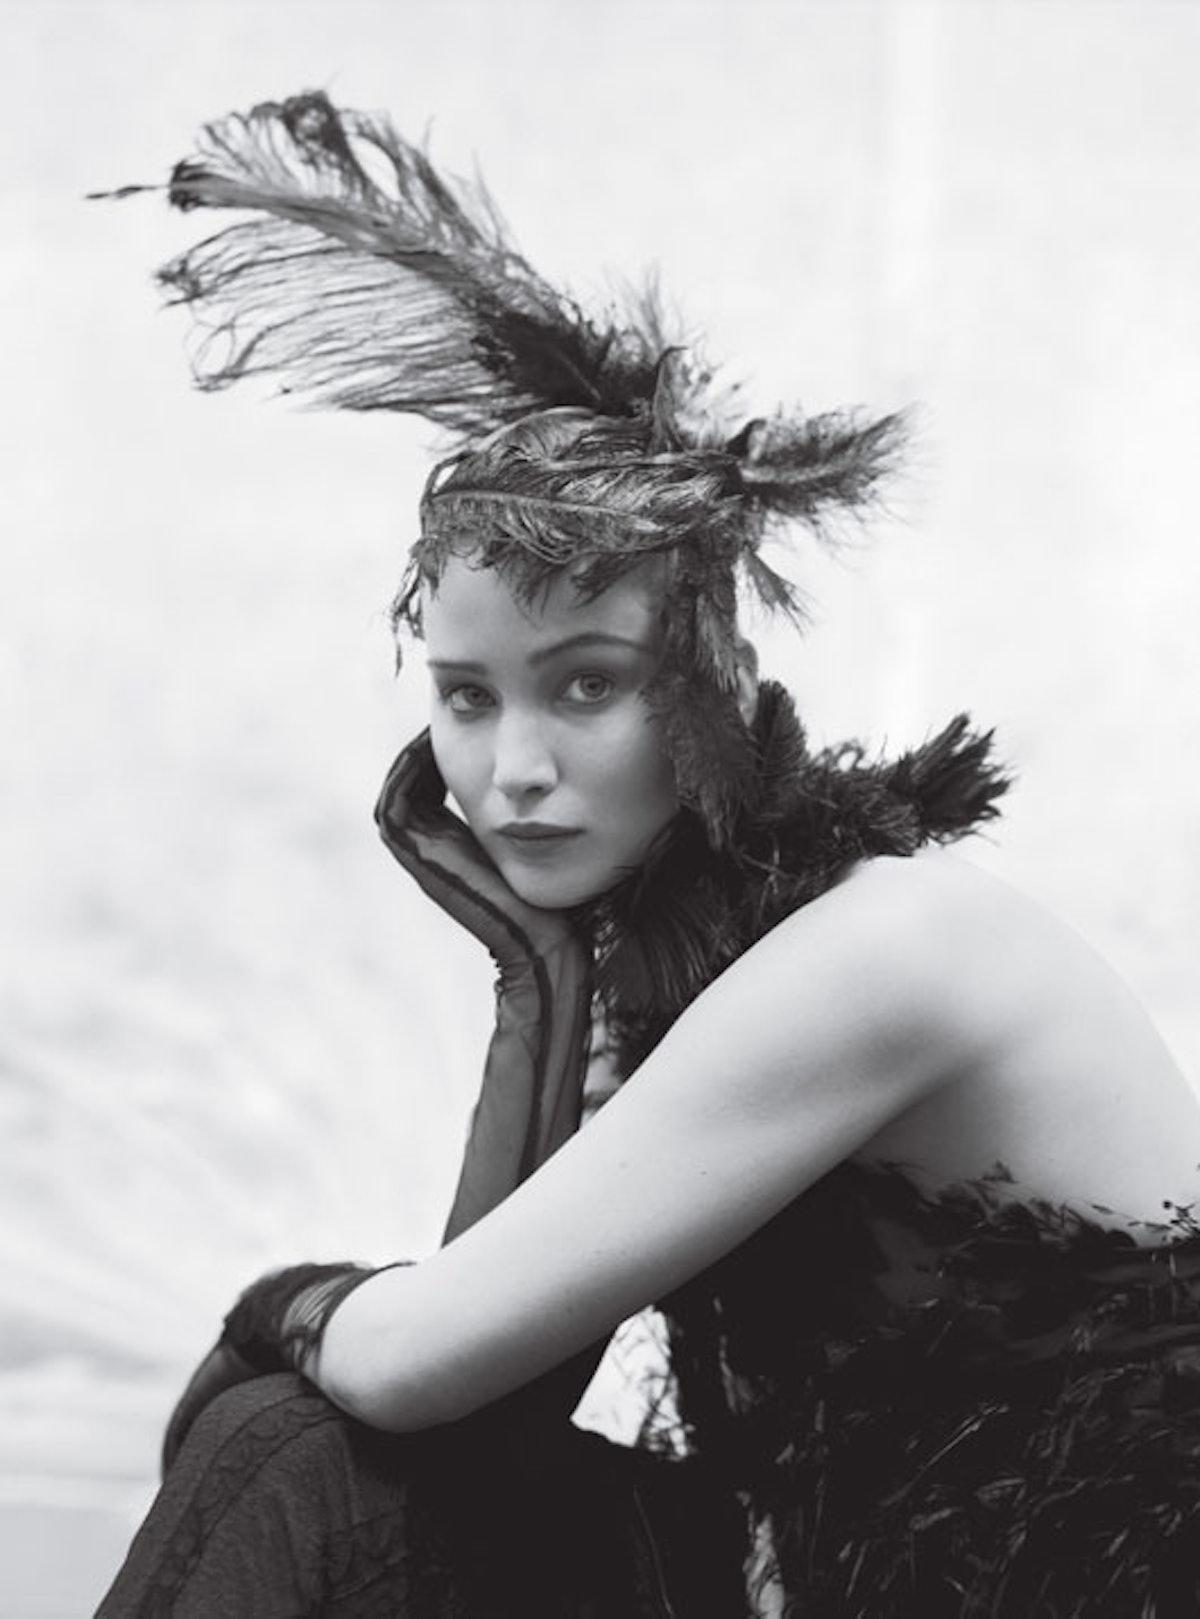 cess-jennifer-lawrence-actress-katniss-everdeen-hunger-games-cover-story-04-l